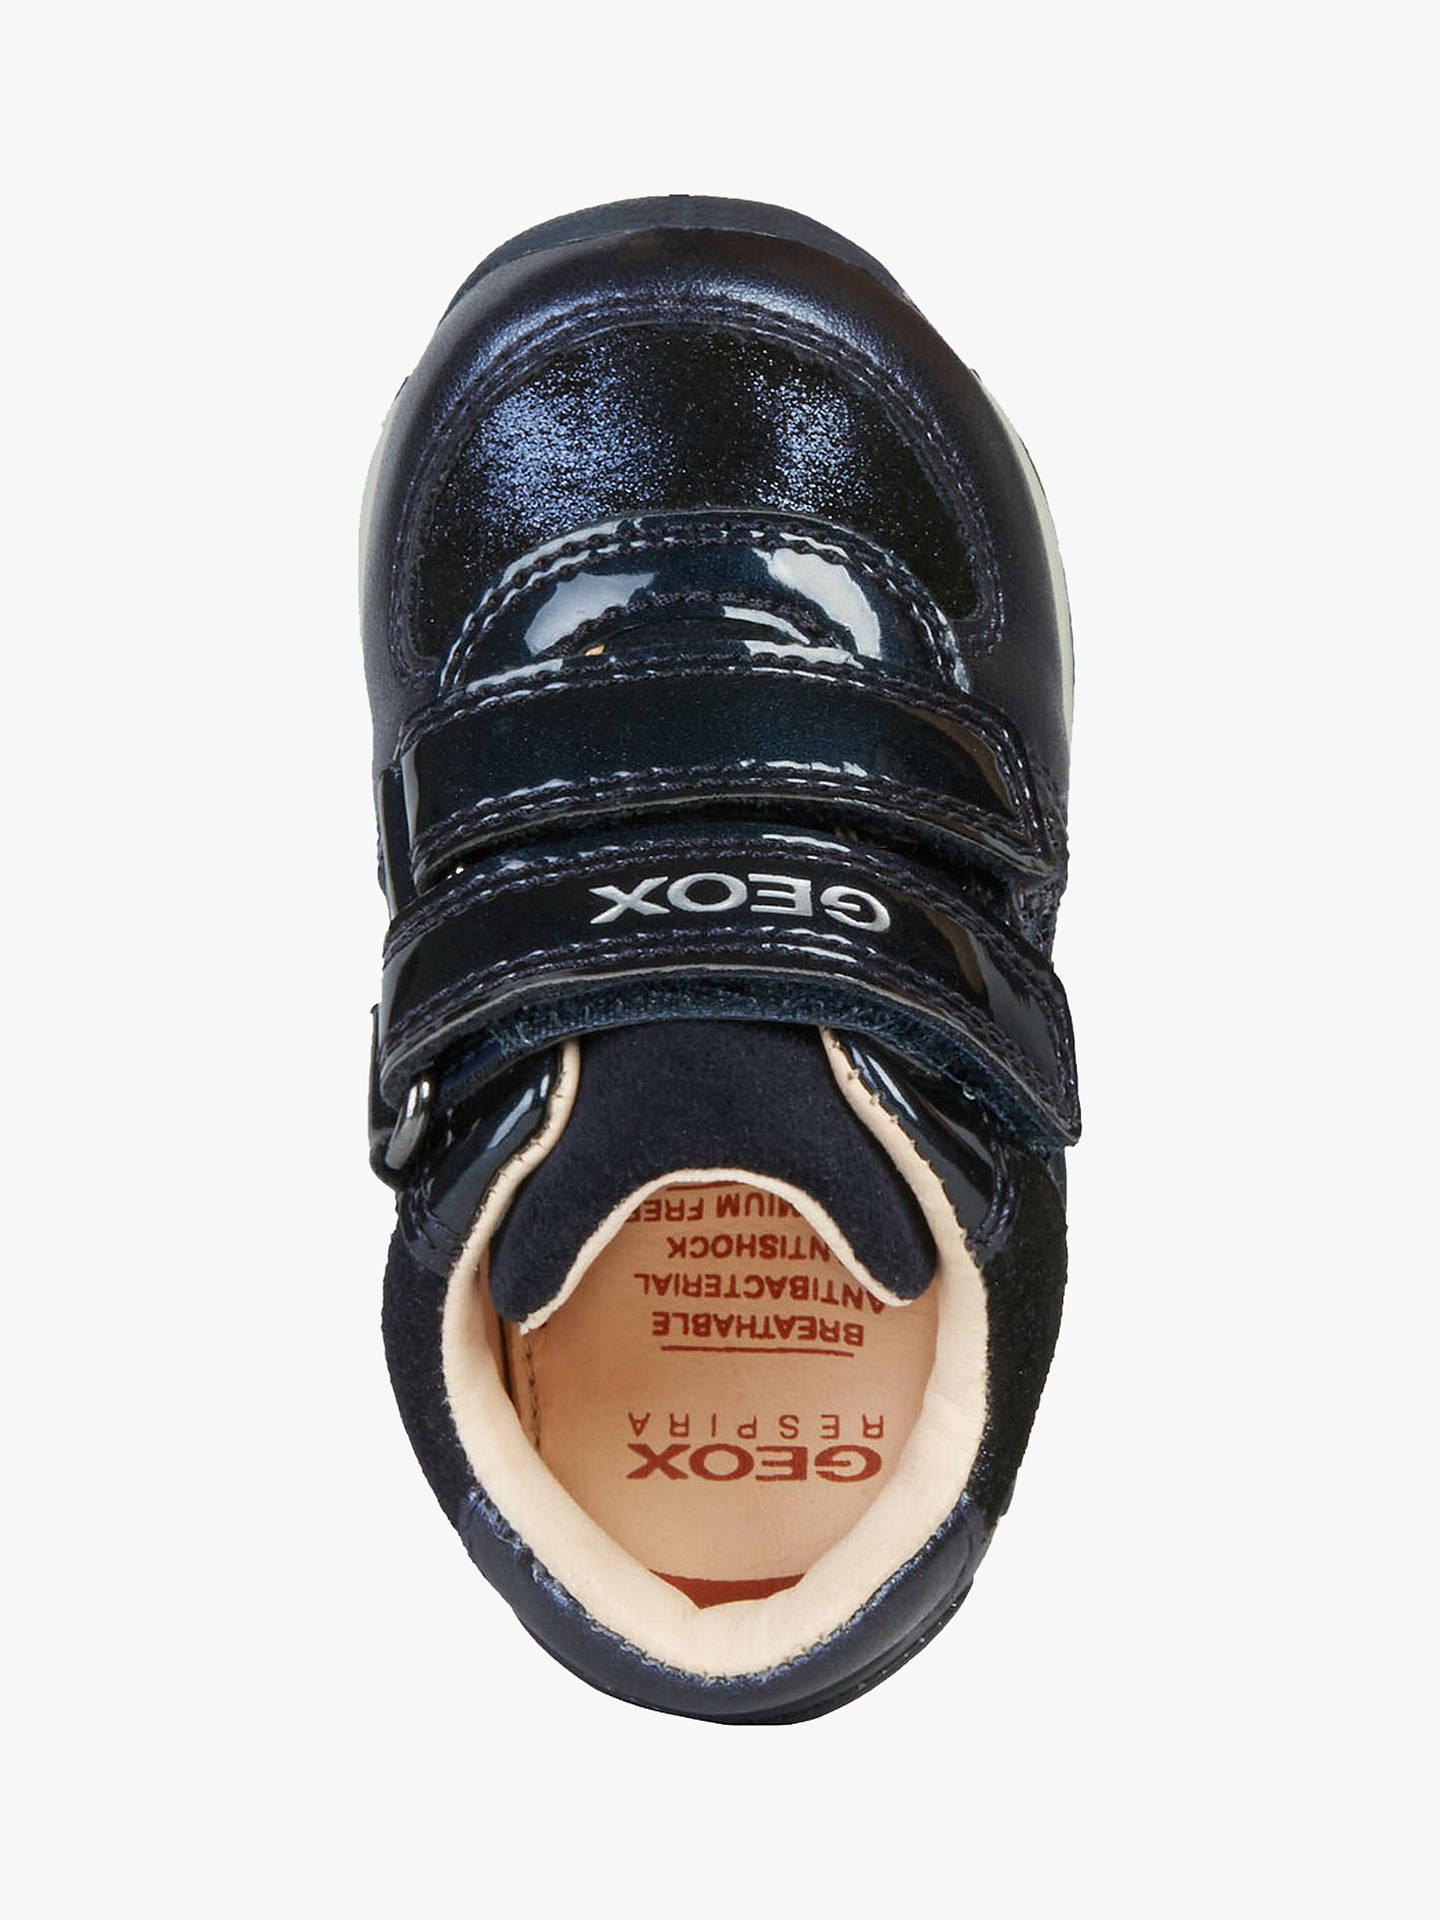 best website 8ecf0 21a6f Geox Children's Each Girl Sparkle Riptape Shoes, Navy